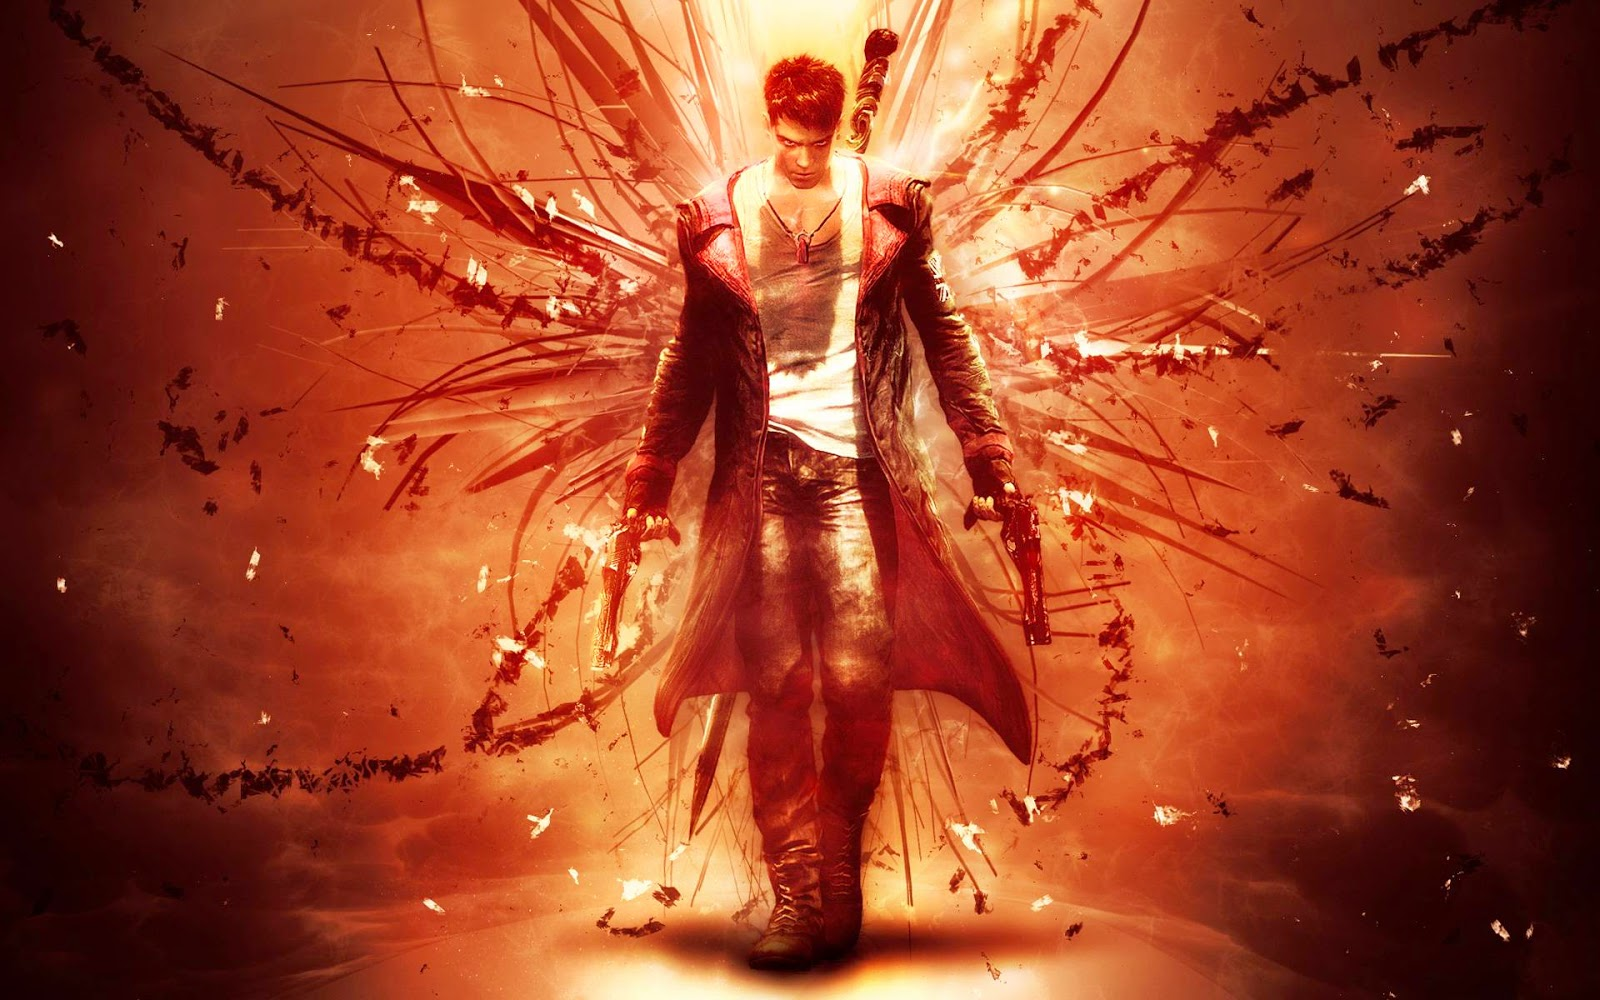 -Devil May Cry وهي لعبة استراتيجية جميلة جدا ولها العديد من الاجزاء ولعبة مشوقة ايضا